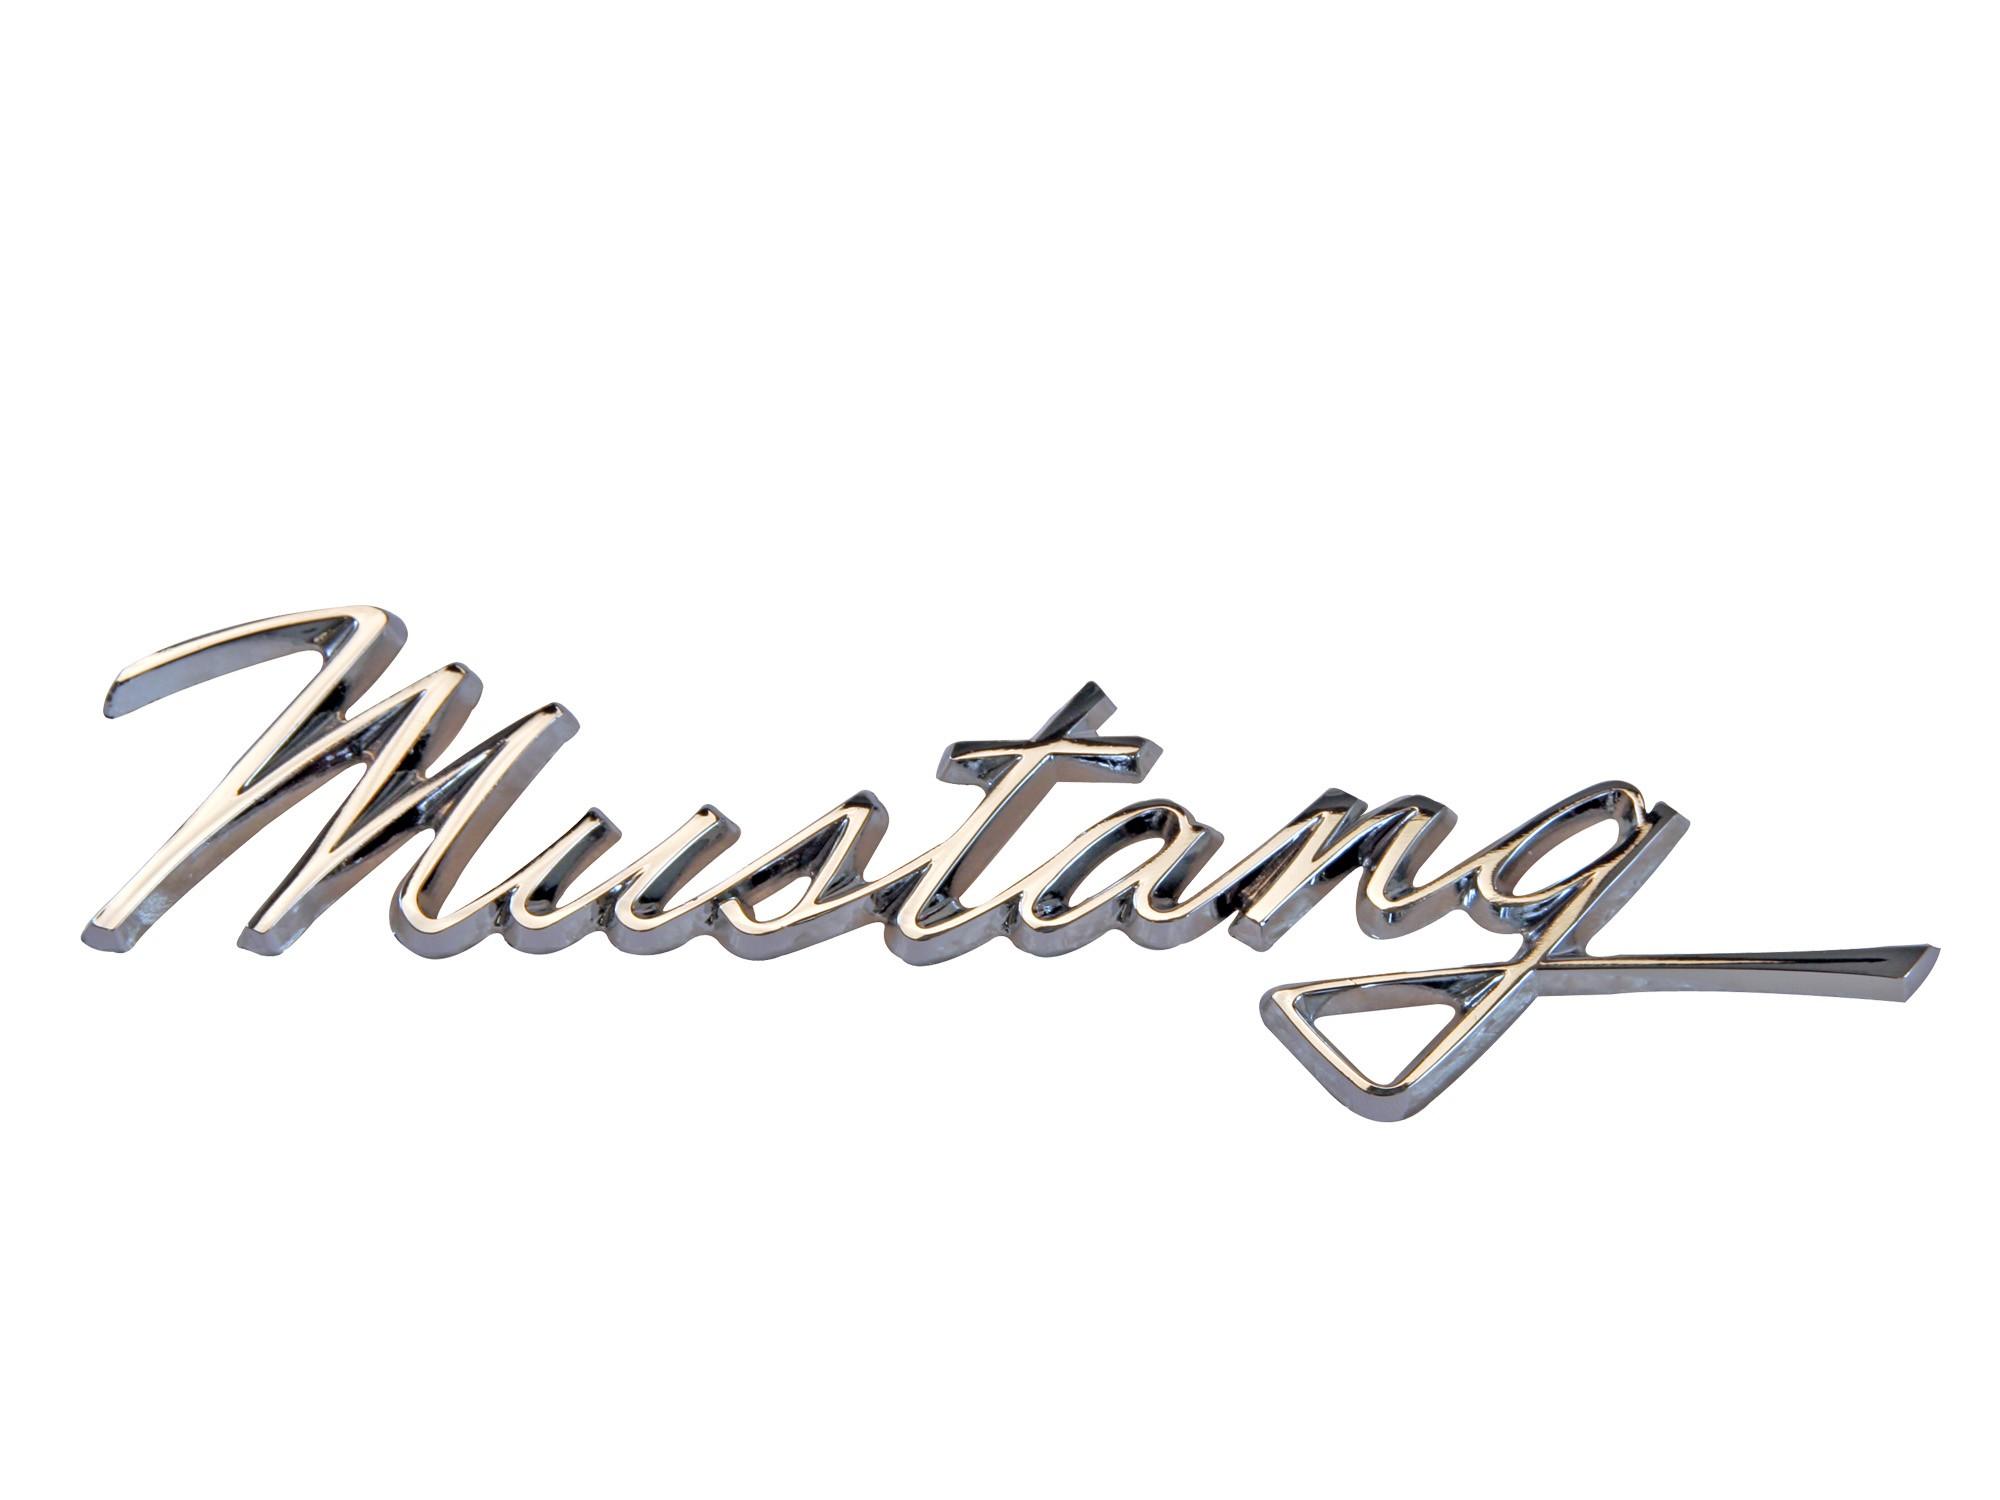 Fender emblem mustang script 1968 scott drake